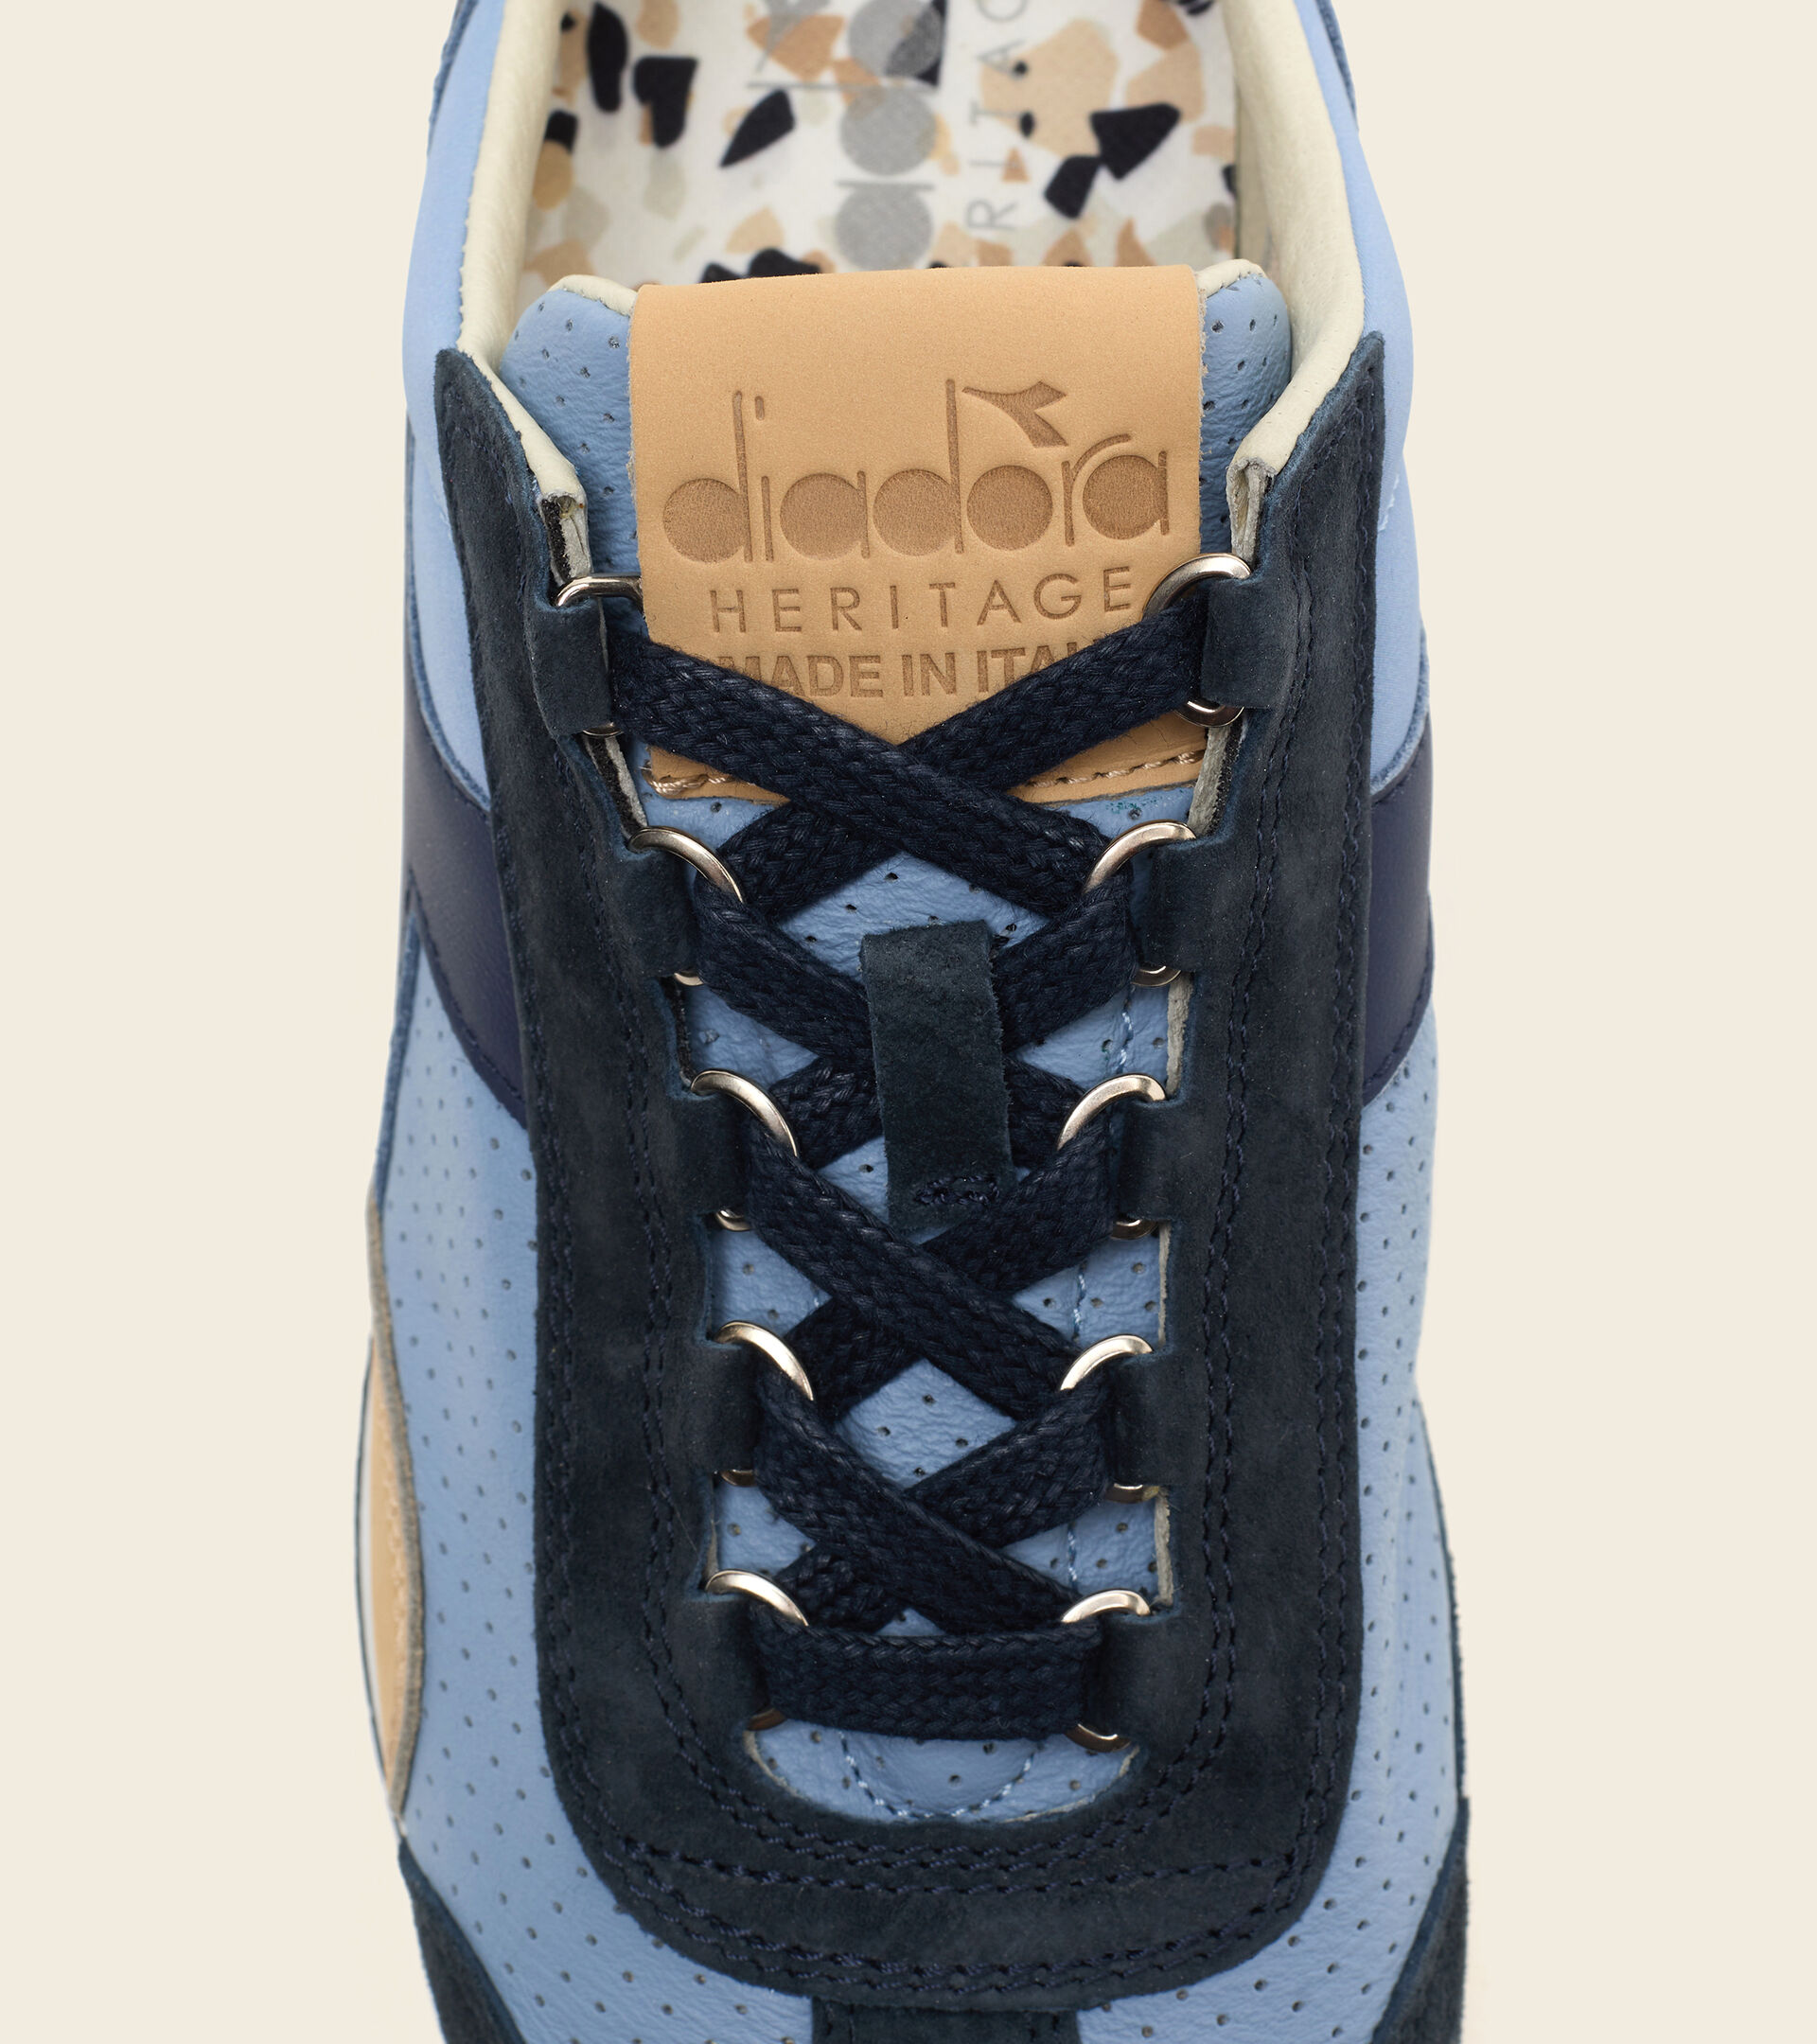 Zapatillas Heritage Made in Italy - Hombre EQUIPE ITALIA TELA VACQUERA DESTENIDO - Diadora